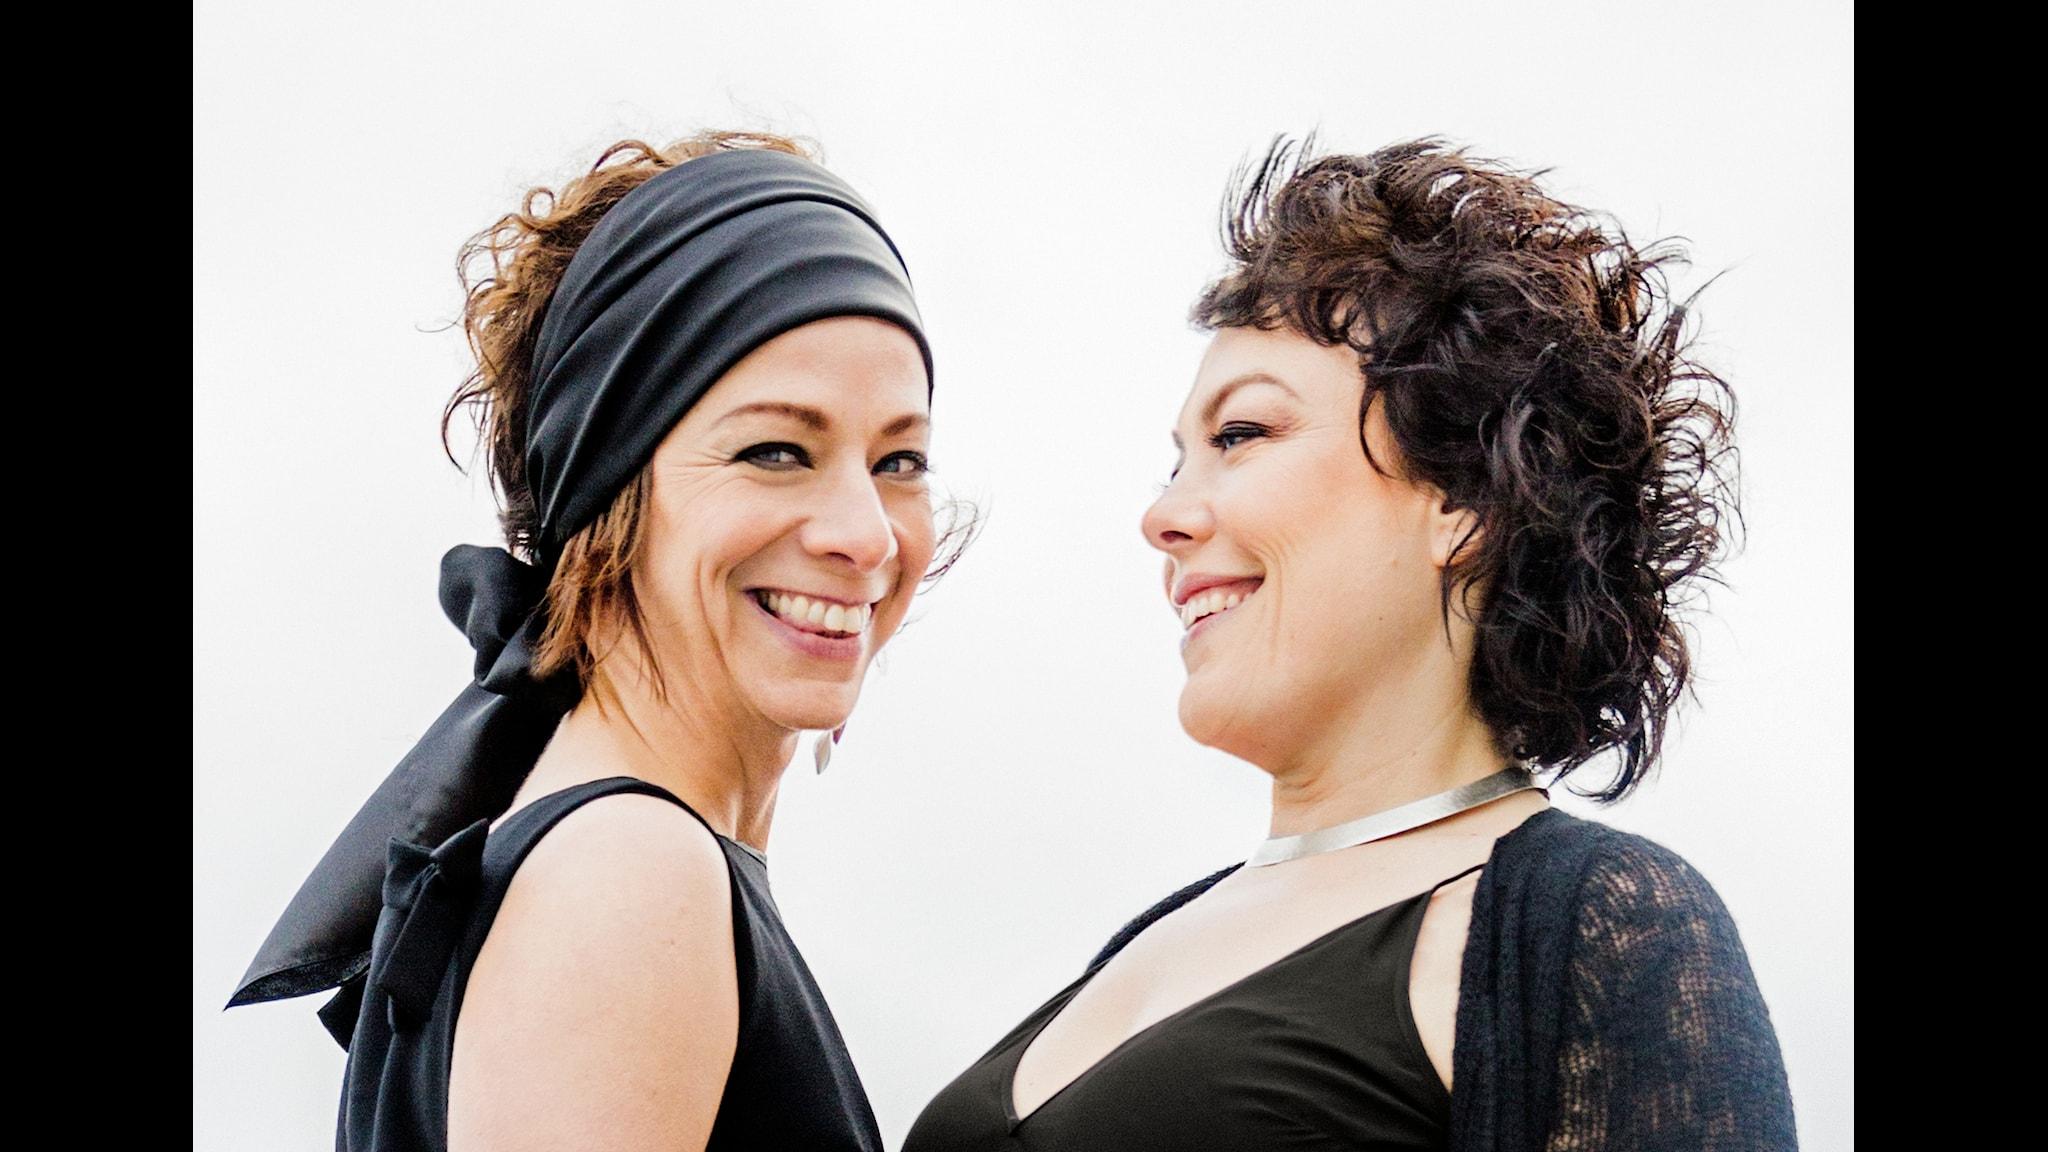 Lise & Gertrud Foto: Tina Axelsson